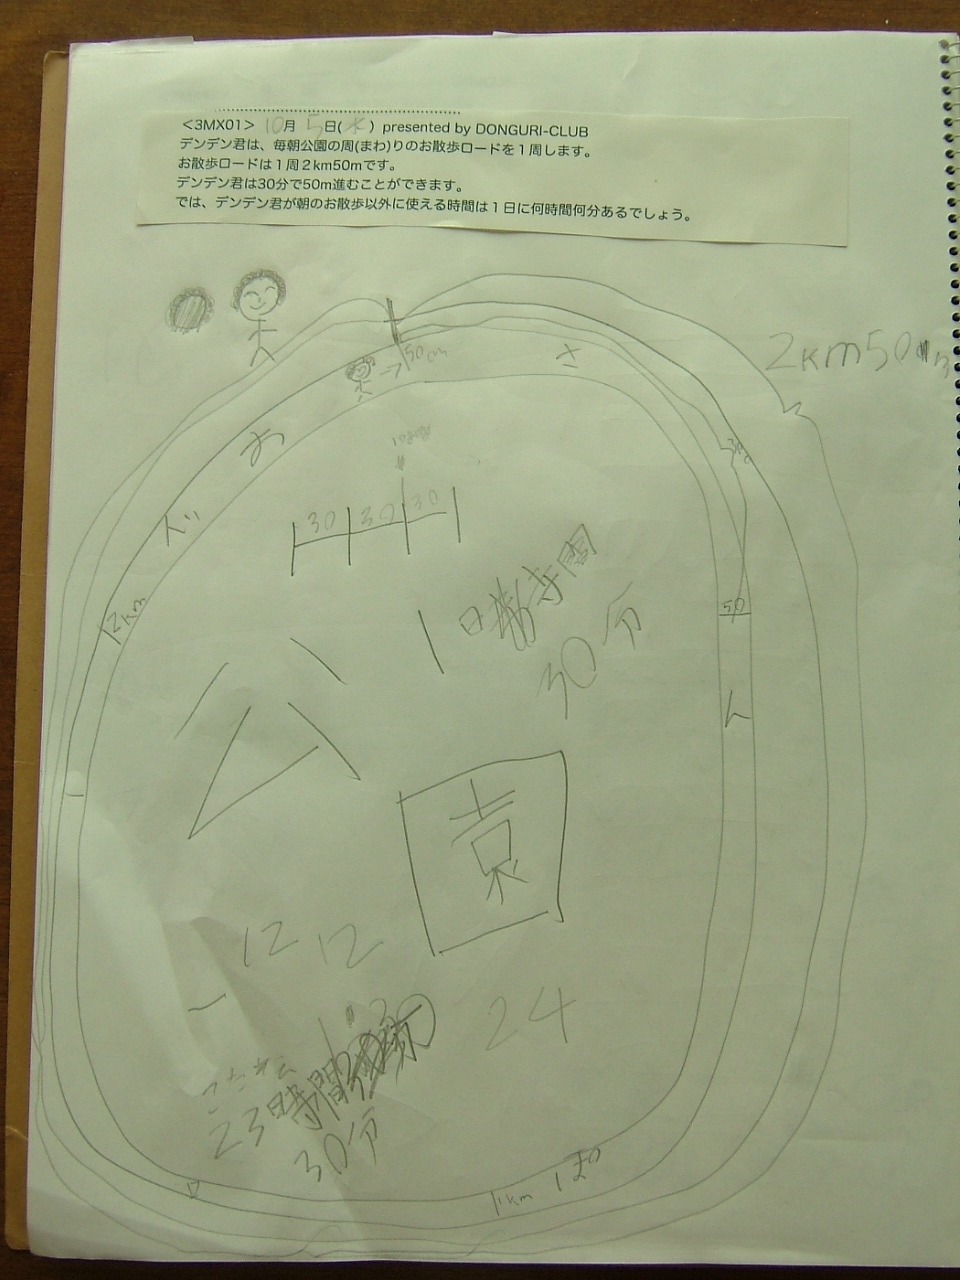 3mx01 1005